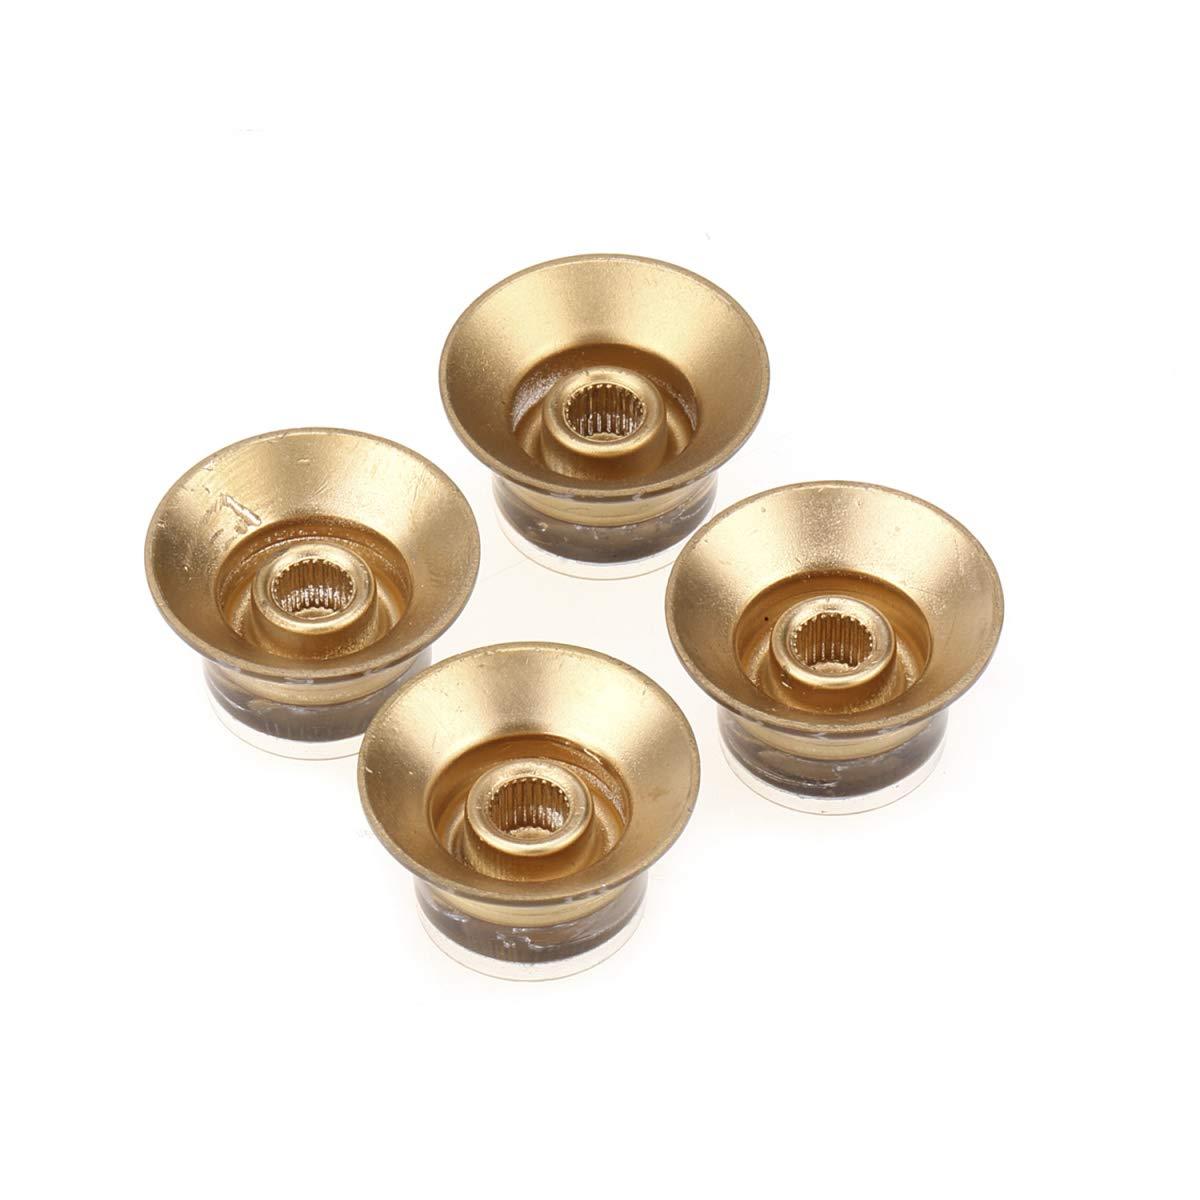 Musiclily Pro Tama/ño M/étrico 18 Splines Botones de Potenci/ómetros Reflector 2 Volumen 2 Tono Perillas Set para Asia Import Guitarra o Bajo Split Shaft Pots Oro con Oro Top